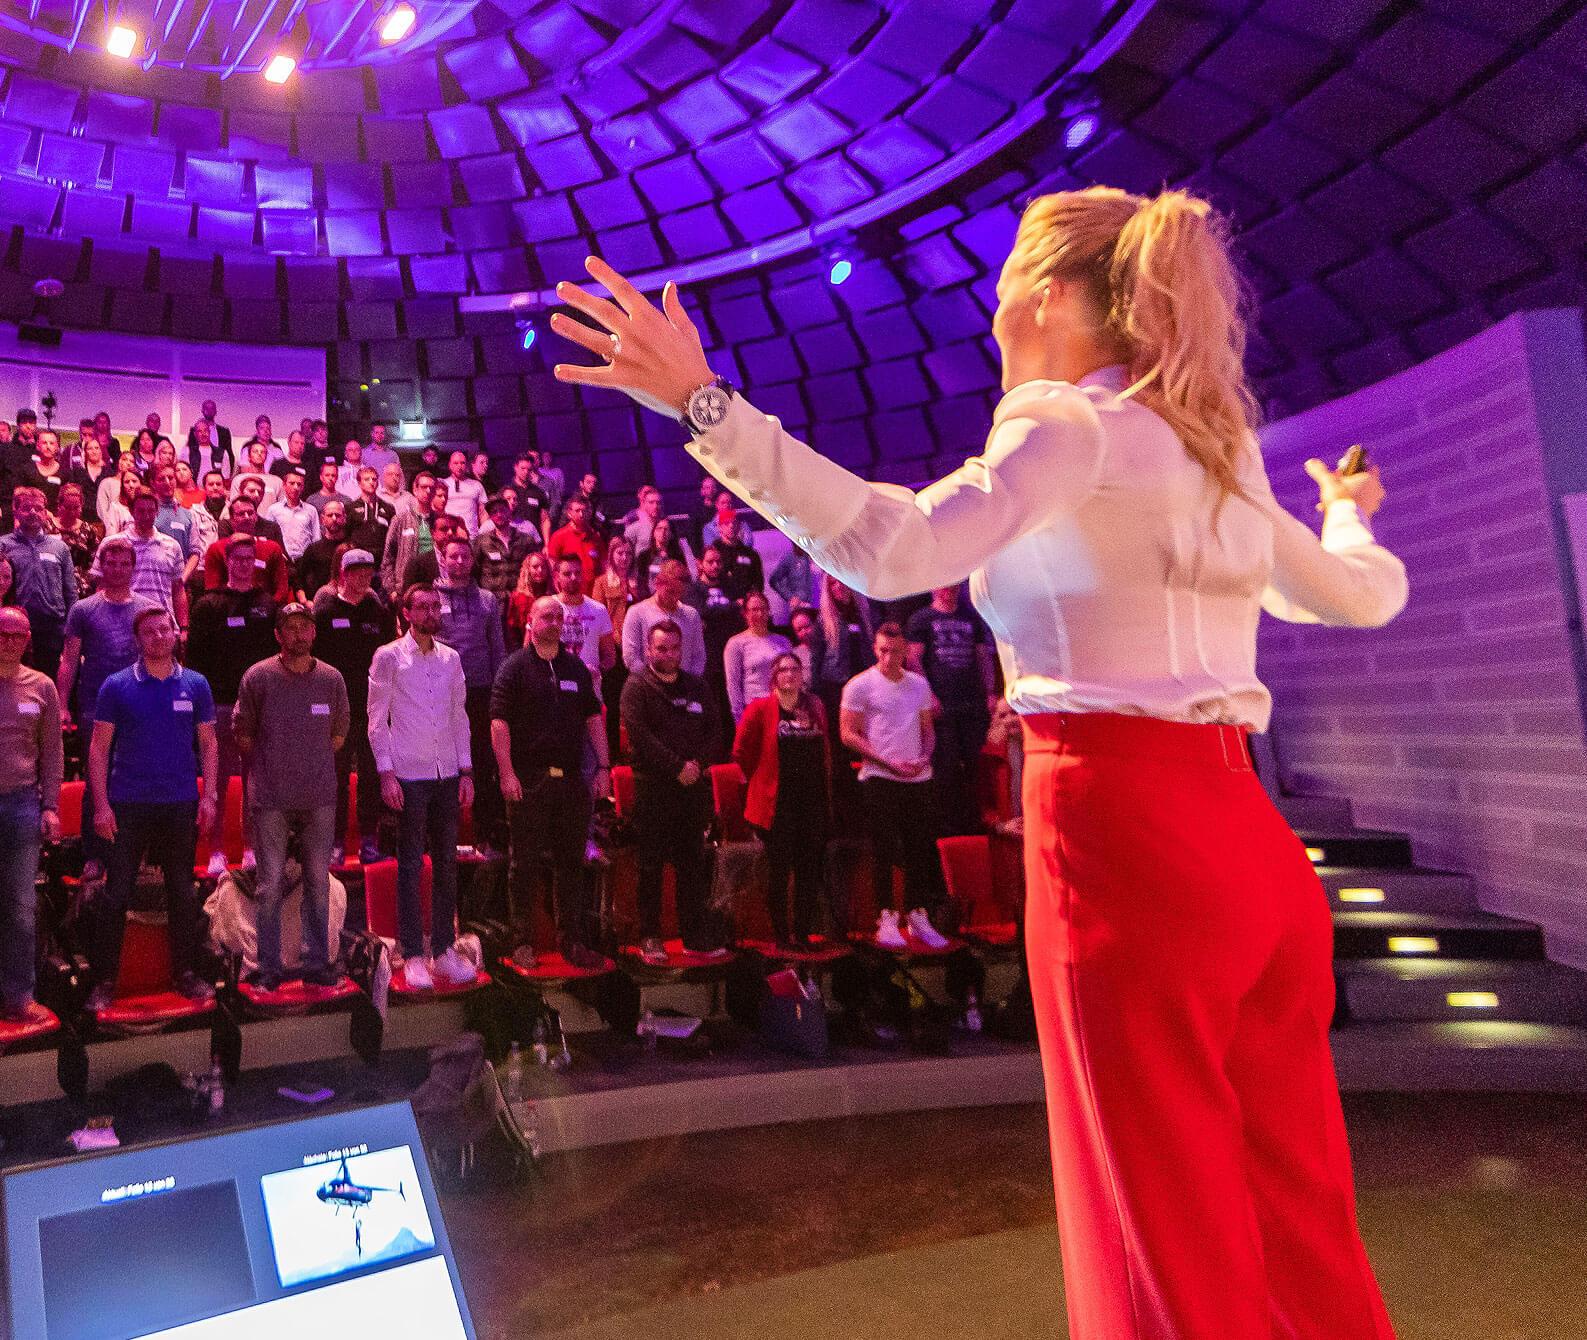 miriam_höller_stuntfrau_speaker_moderatorin_bildergallerie_27